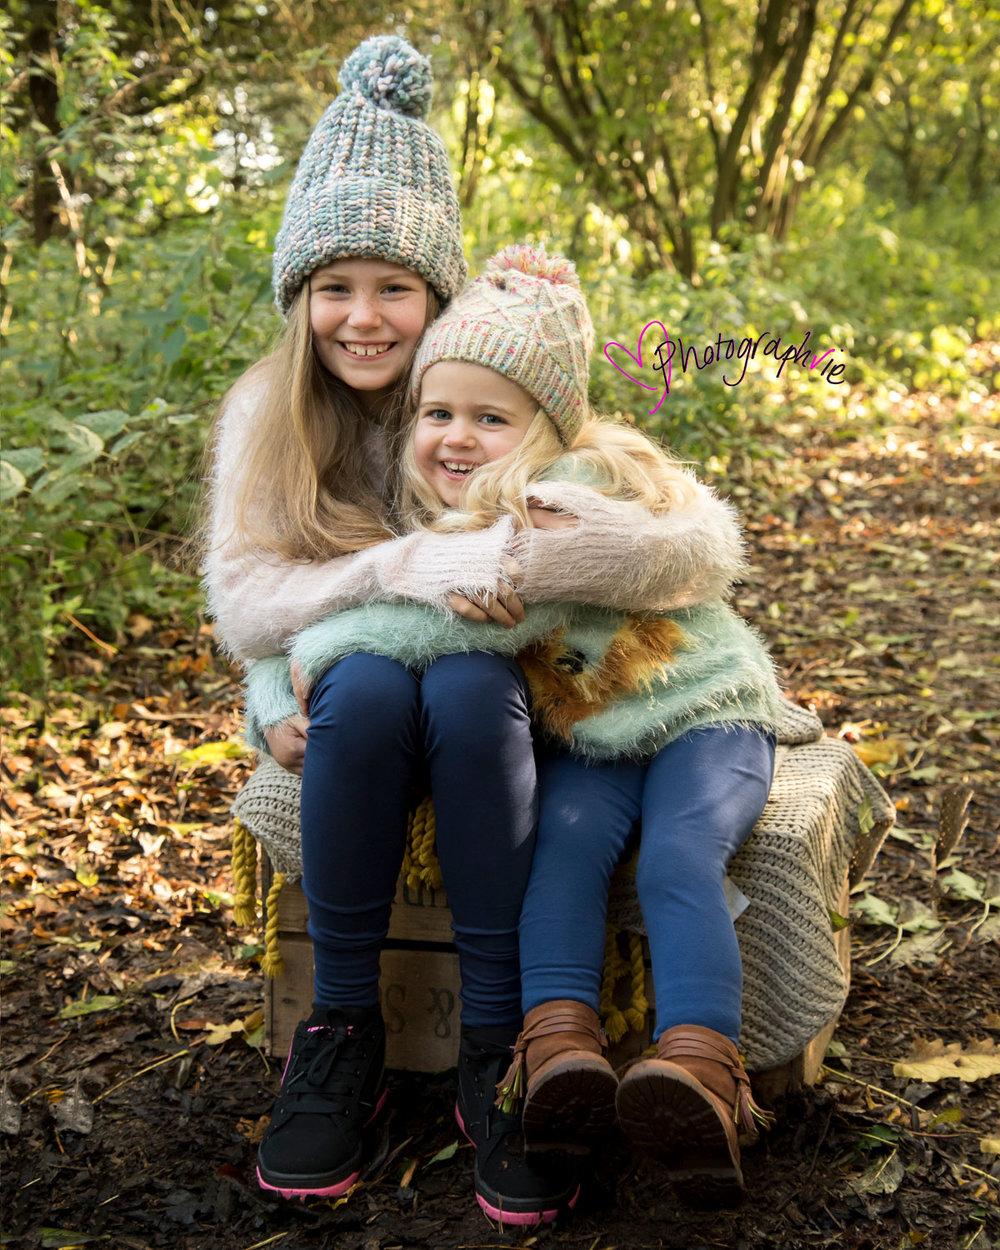 Autumn leaves mini photoshoot ely cambridgeshire family photos baby photographer near me (1).jpg